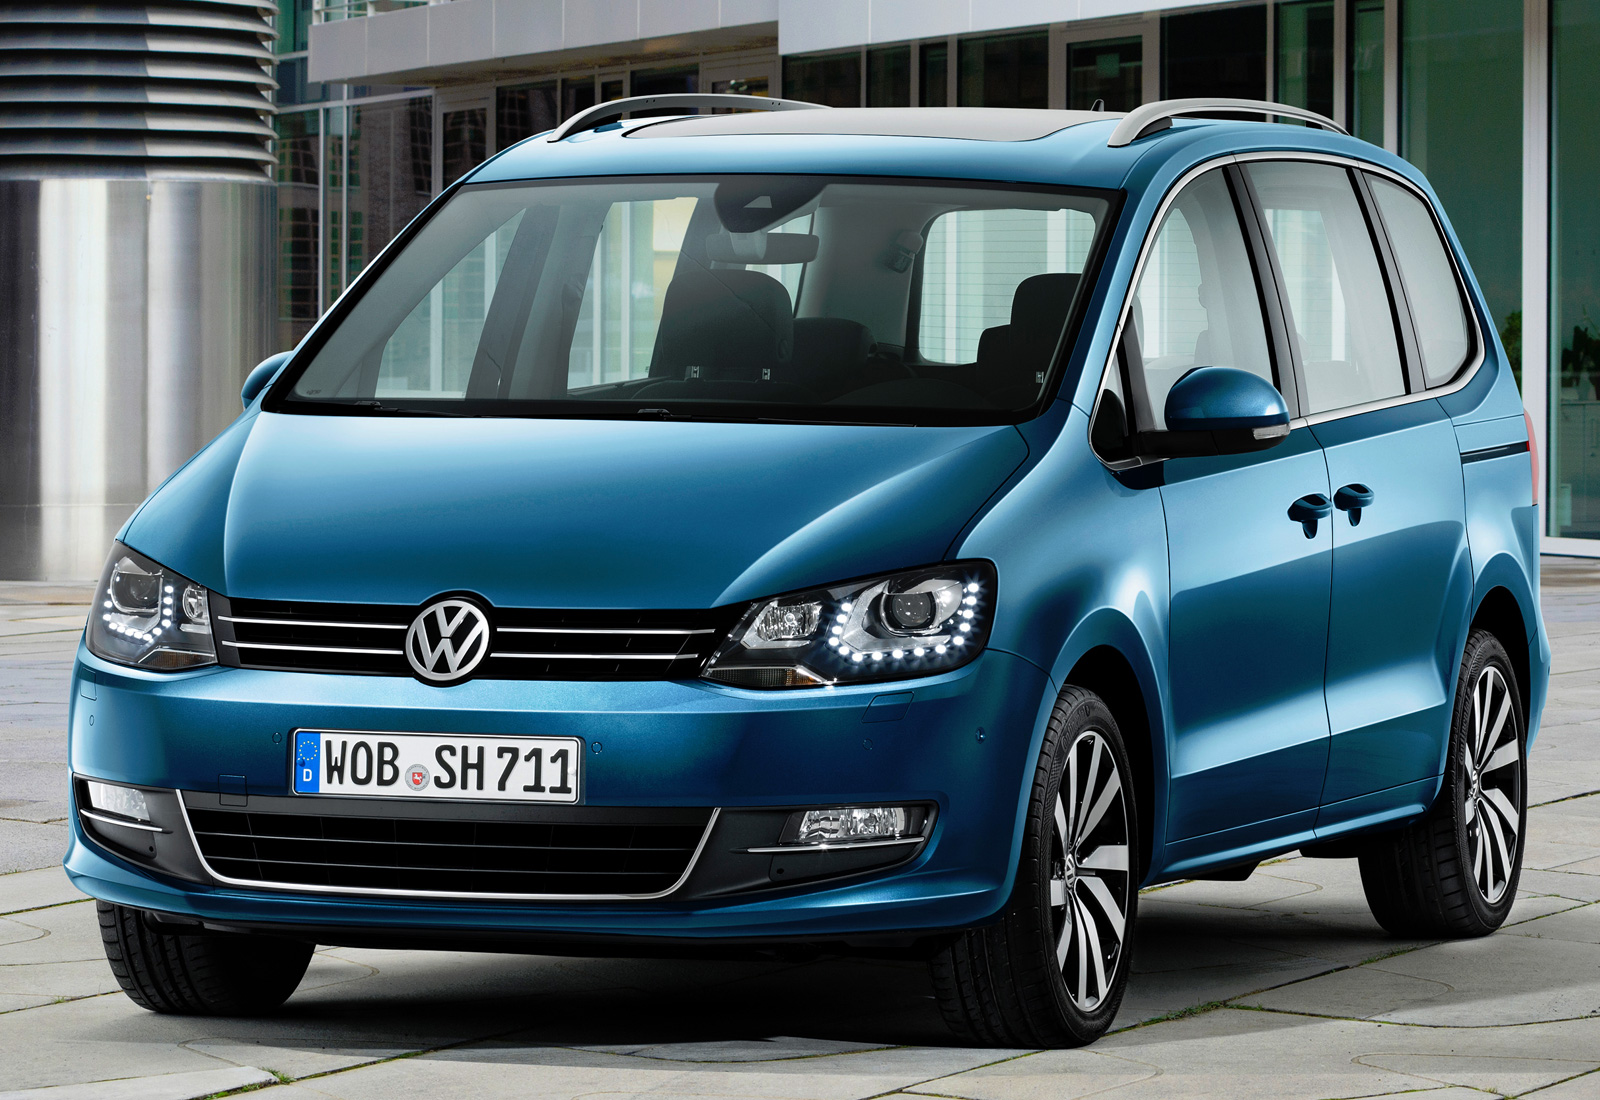 volkswagen sharan 20192020 цена и характеристики